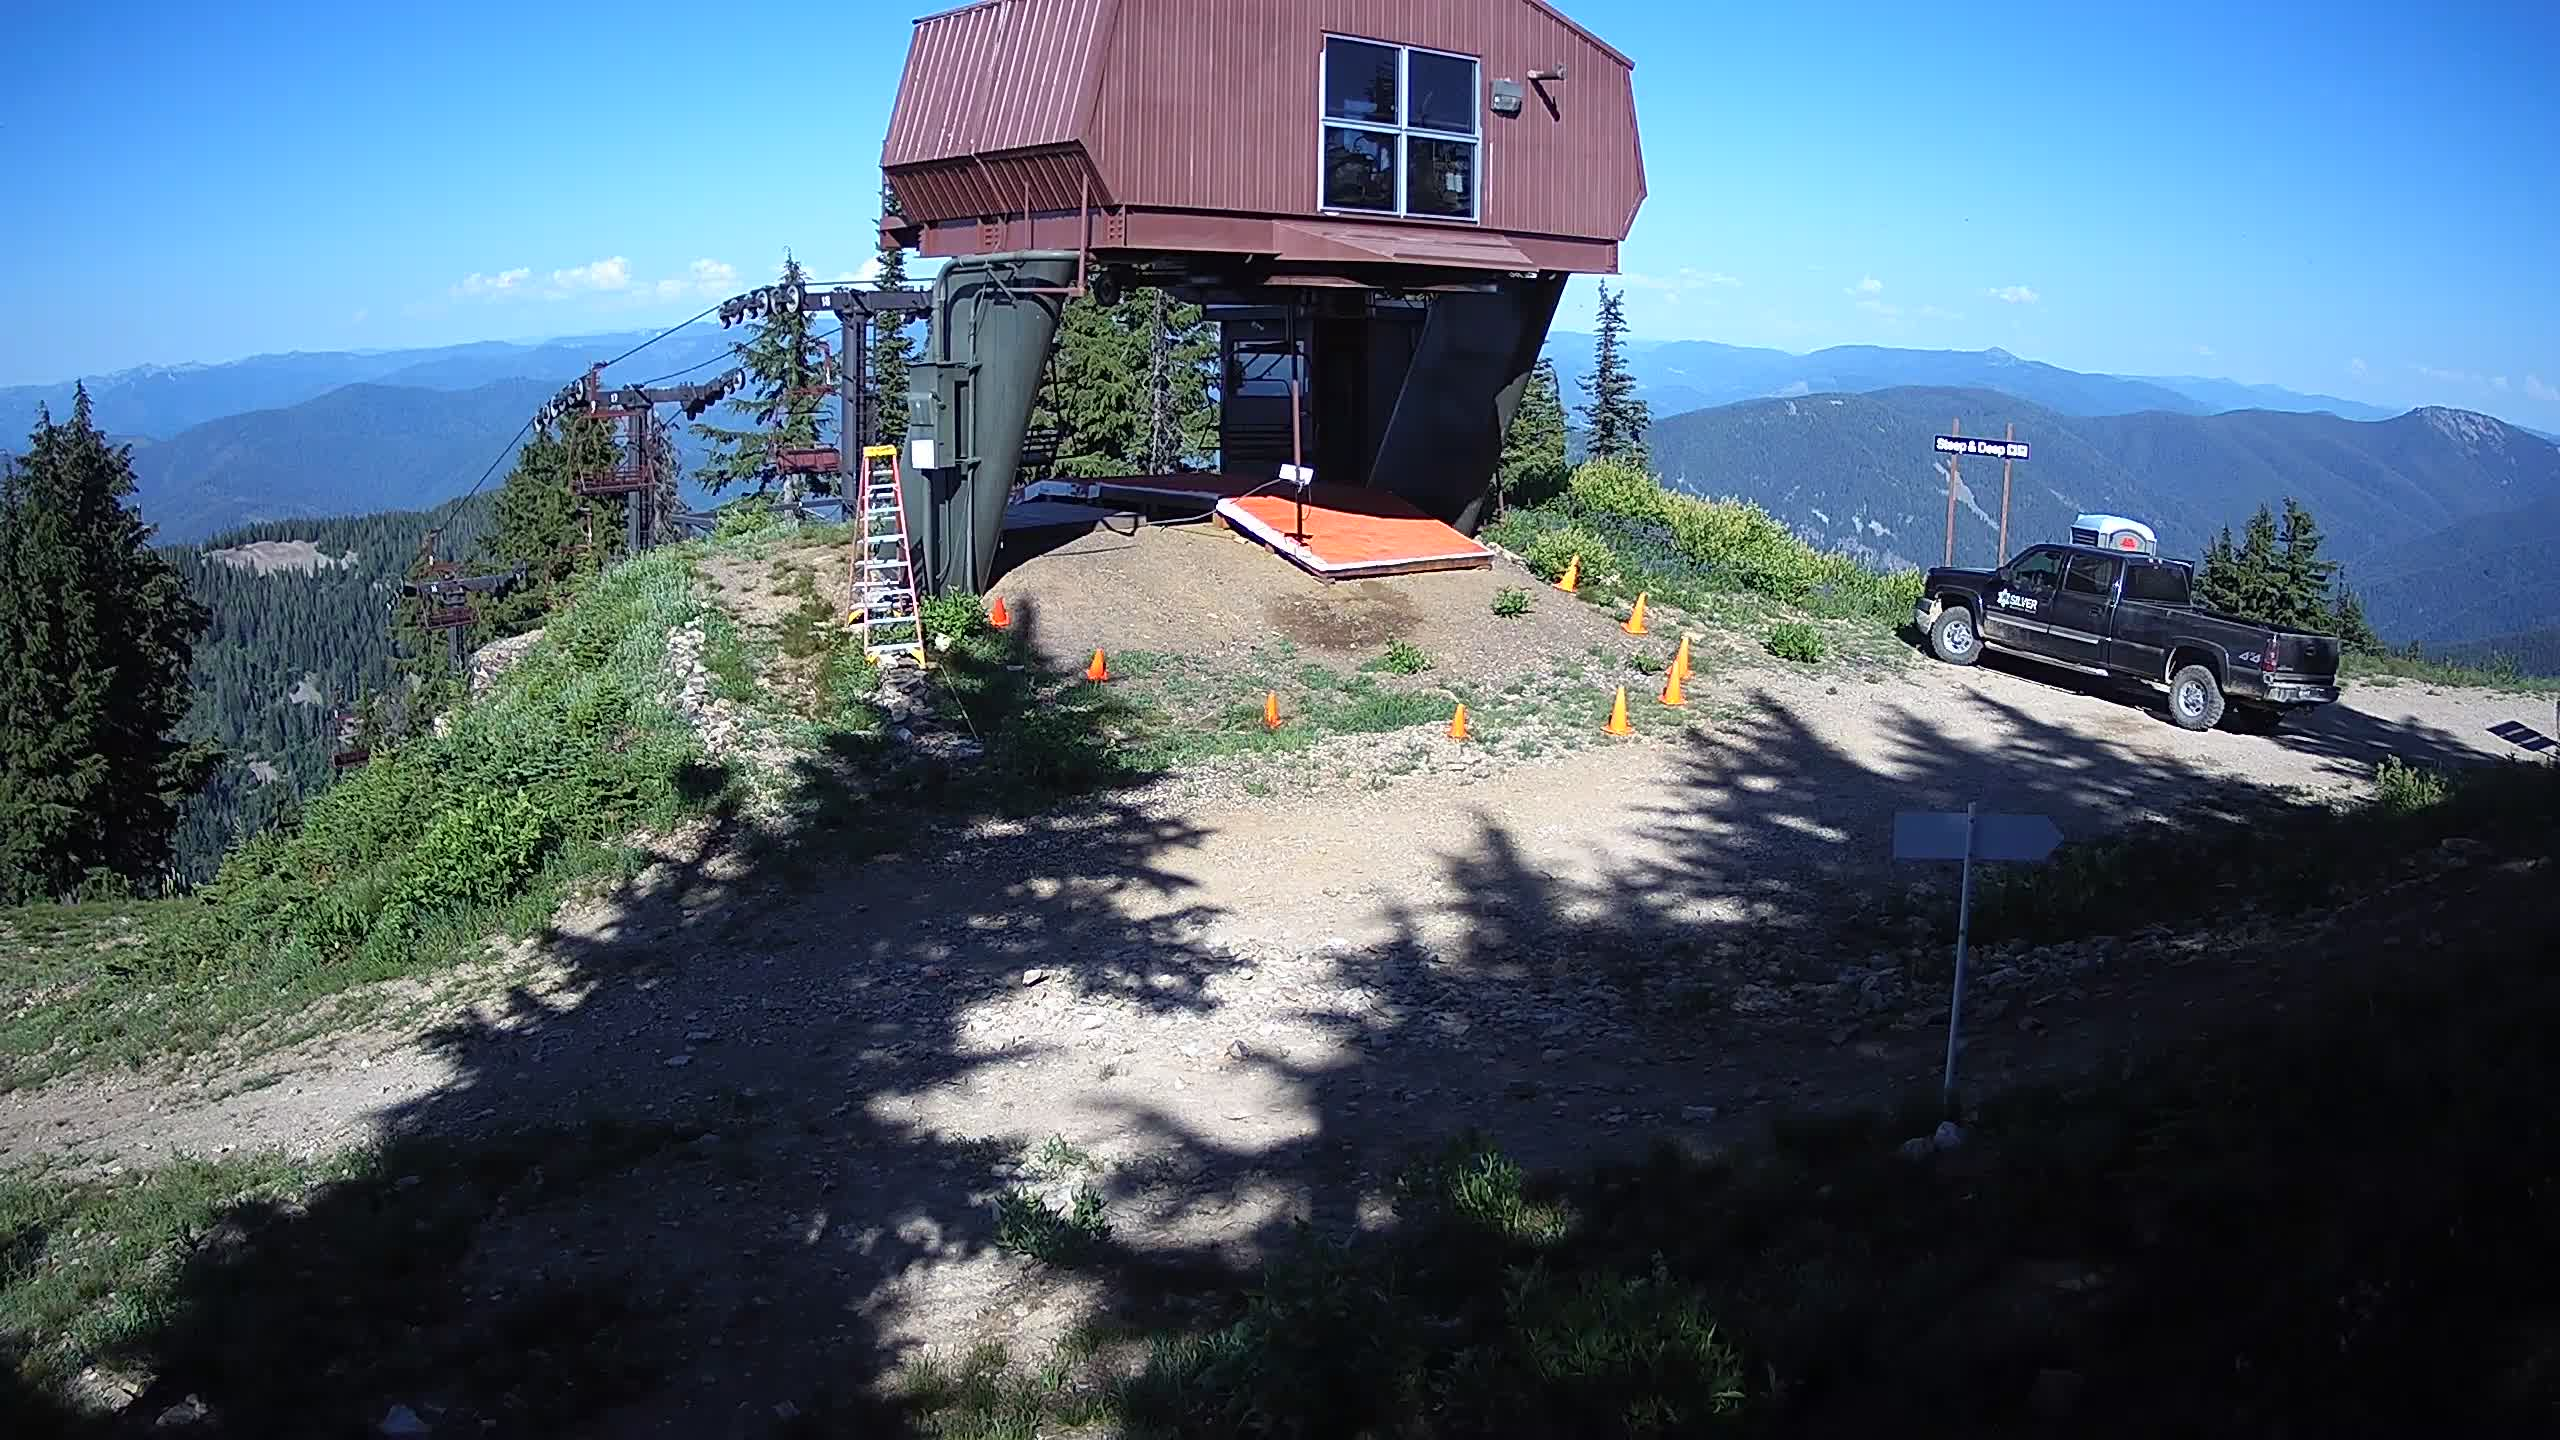 Webcam view from Kellogg Peak in Northern Idaho